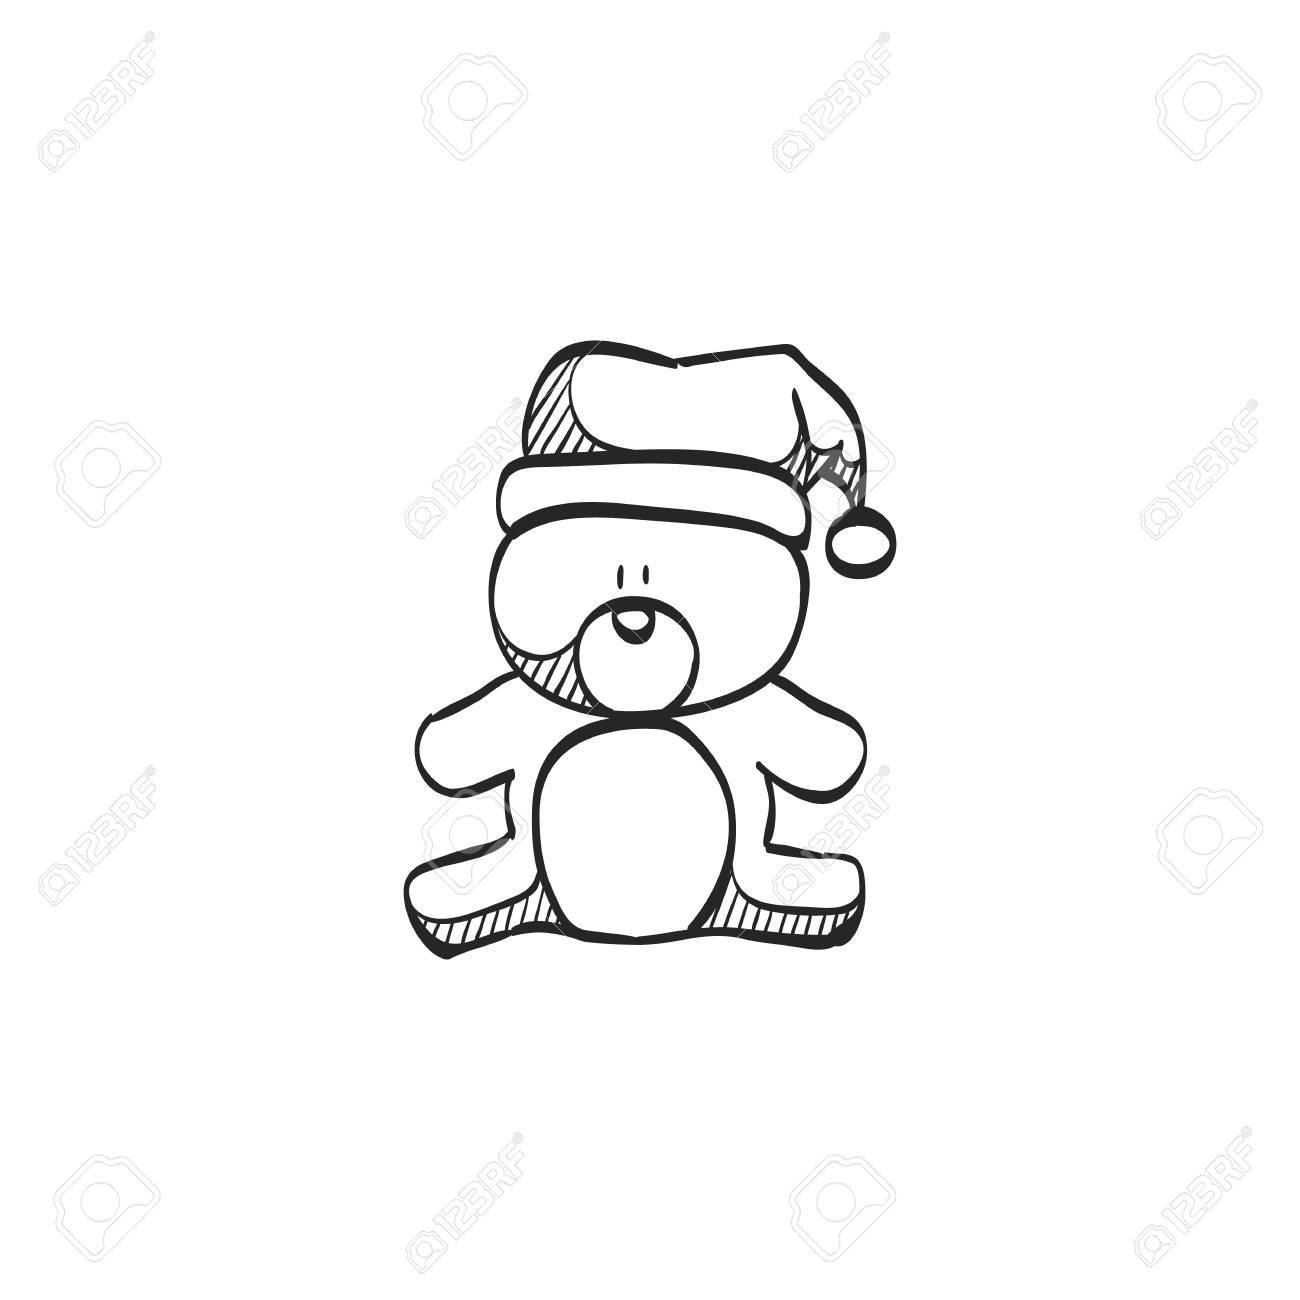 Teddy Bear Icon In Doodle Sketch Lines Christmas Celebration Rh 123rf Com